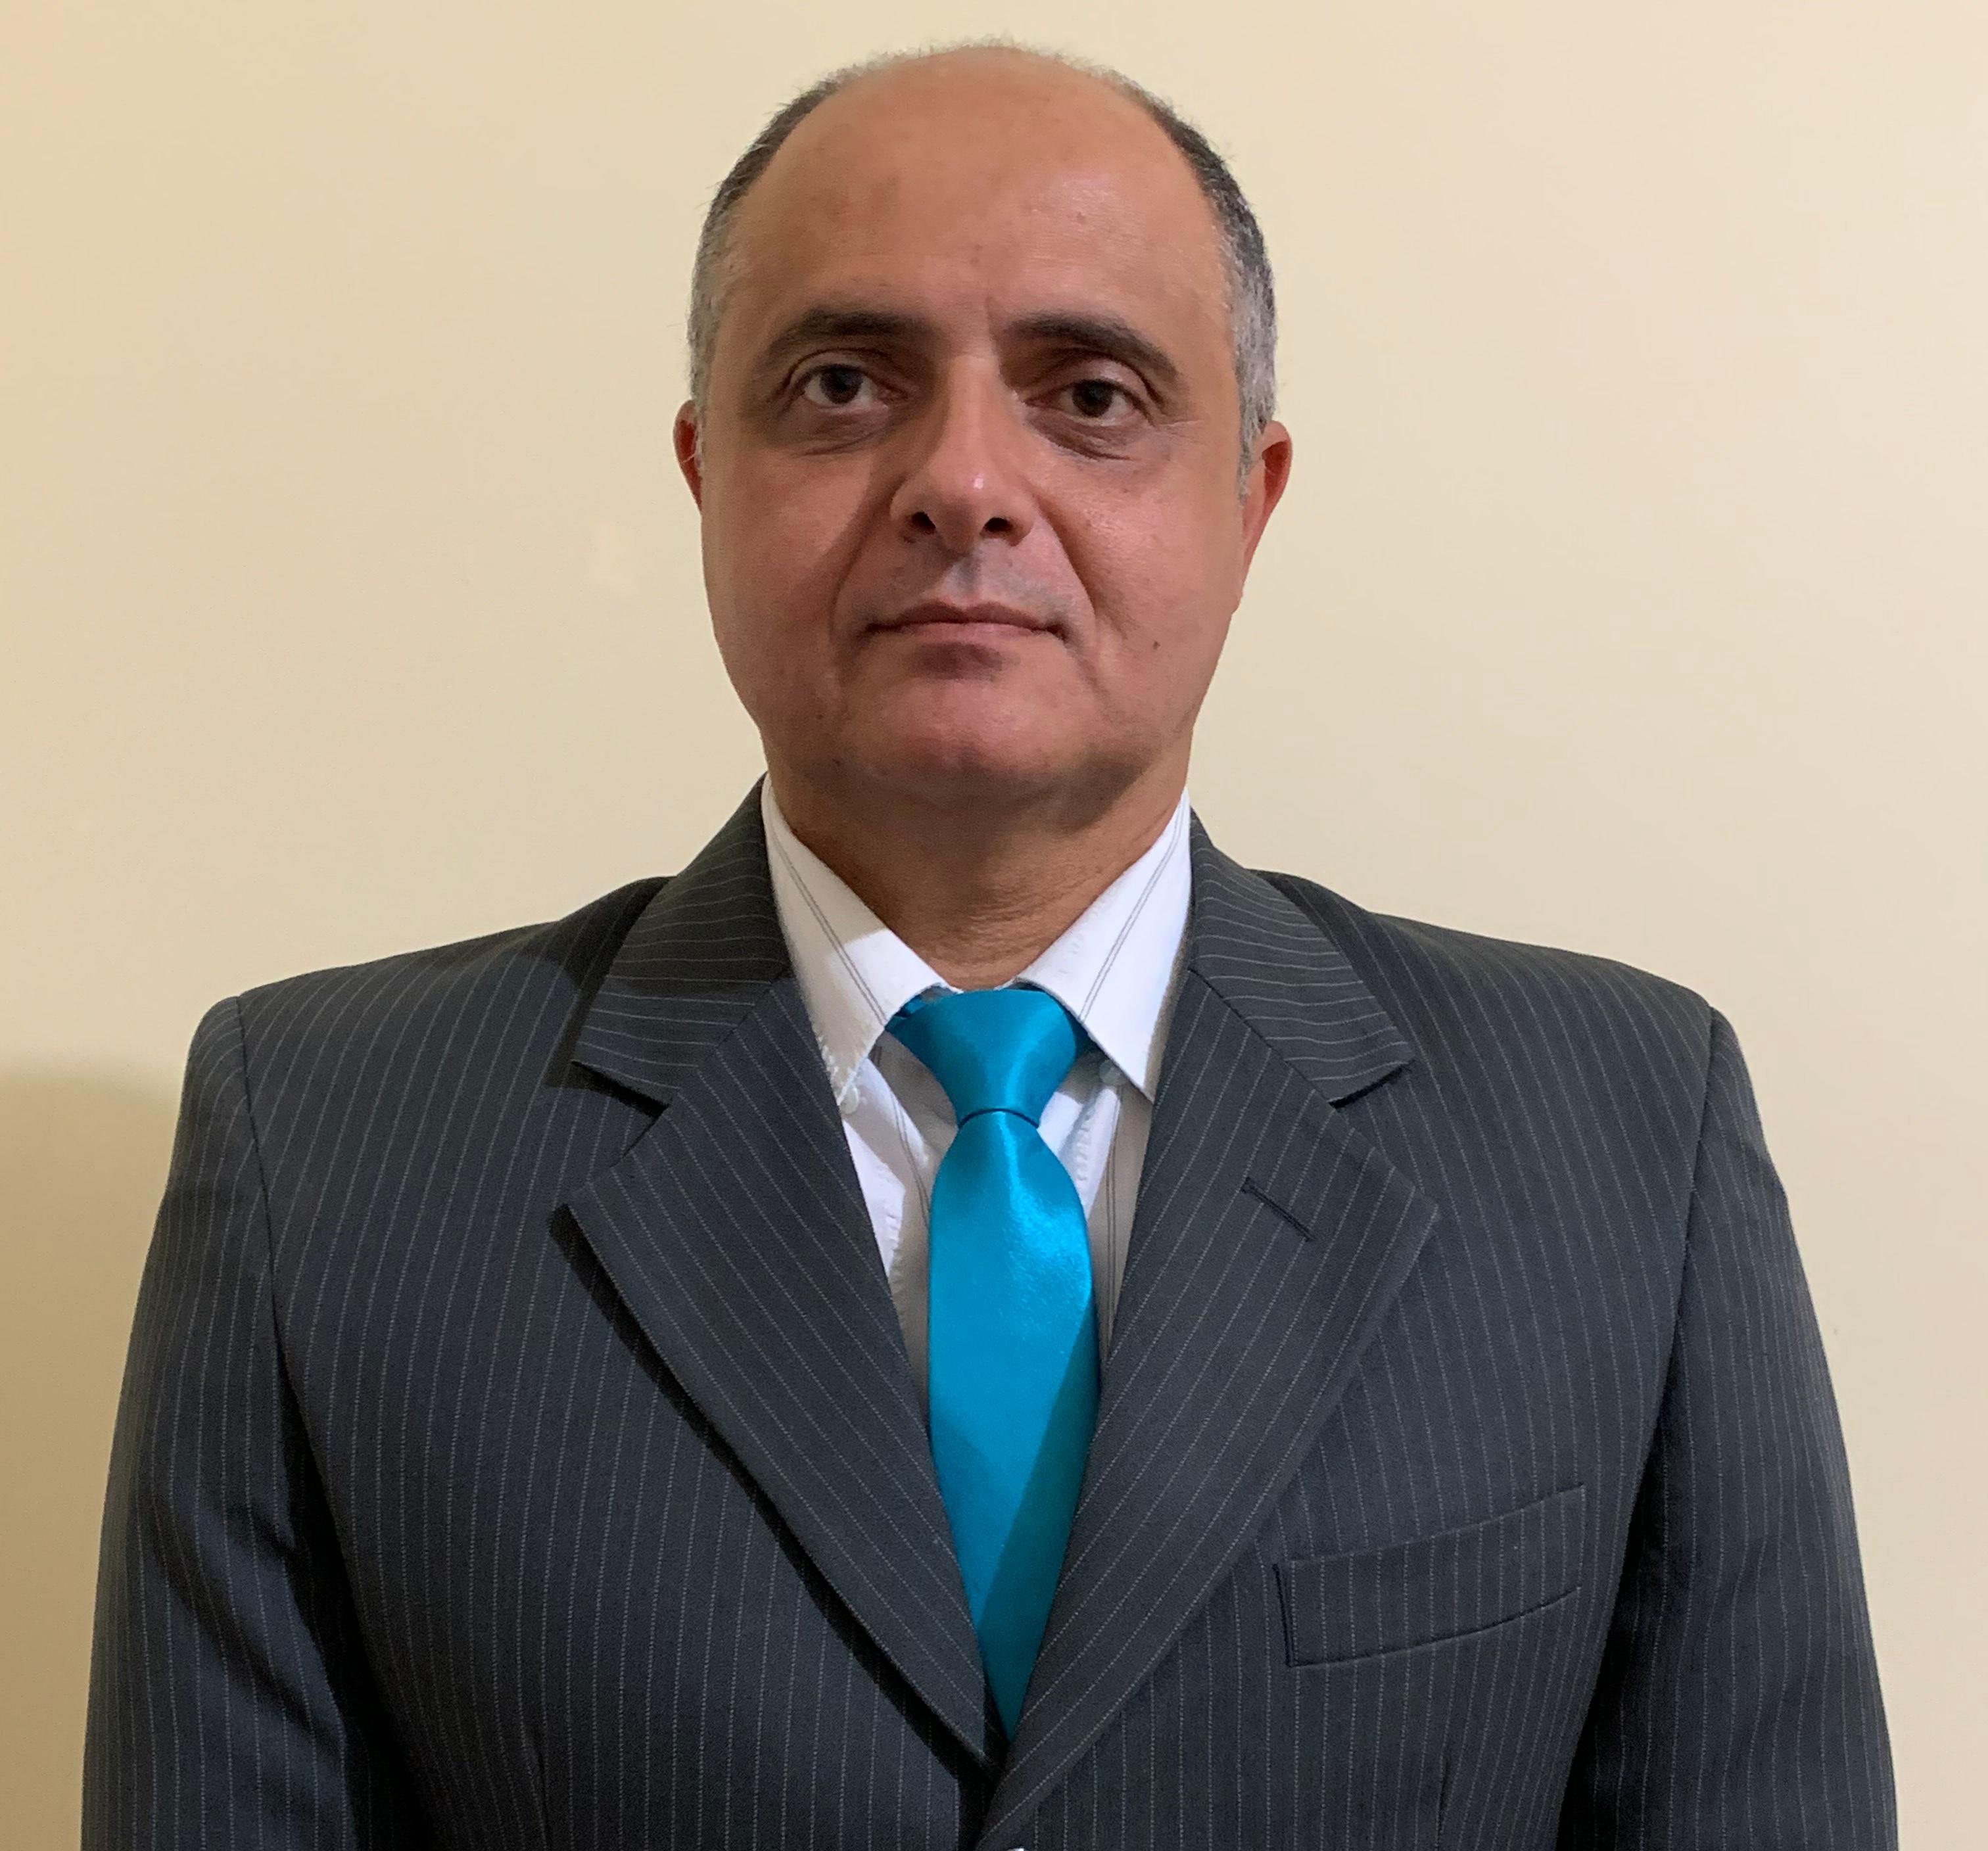 Marco Antonio Rodrigues de Oliveira